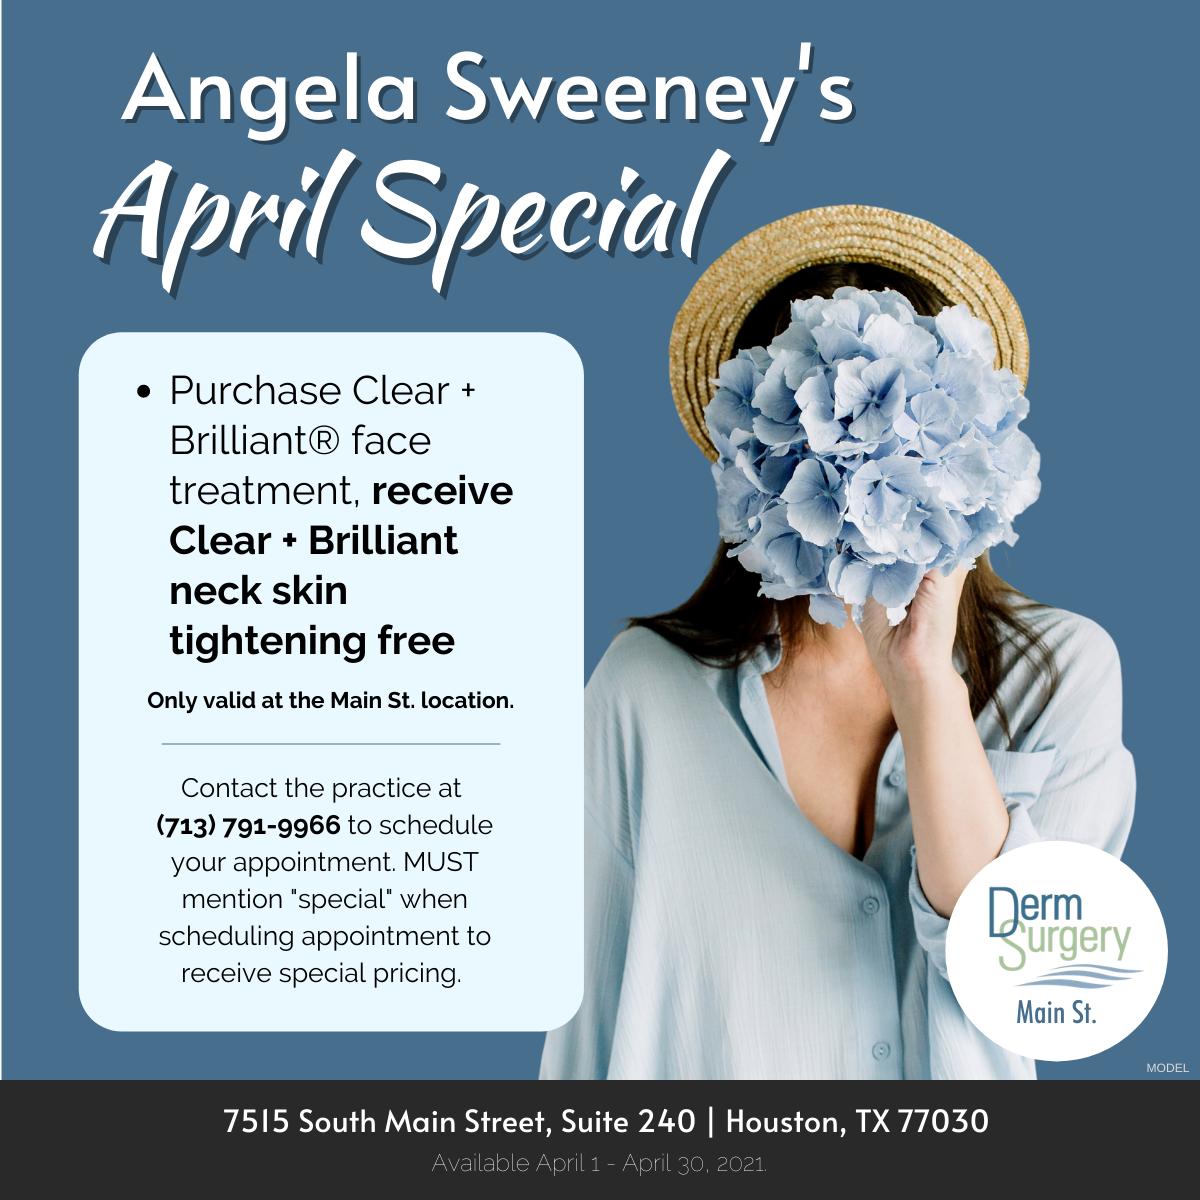 Angela Sweeney's April Special